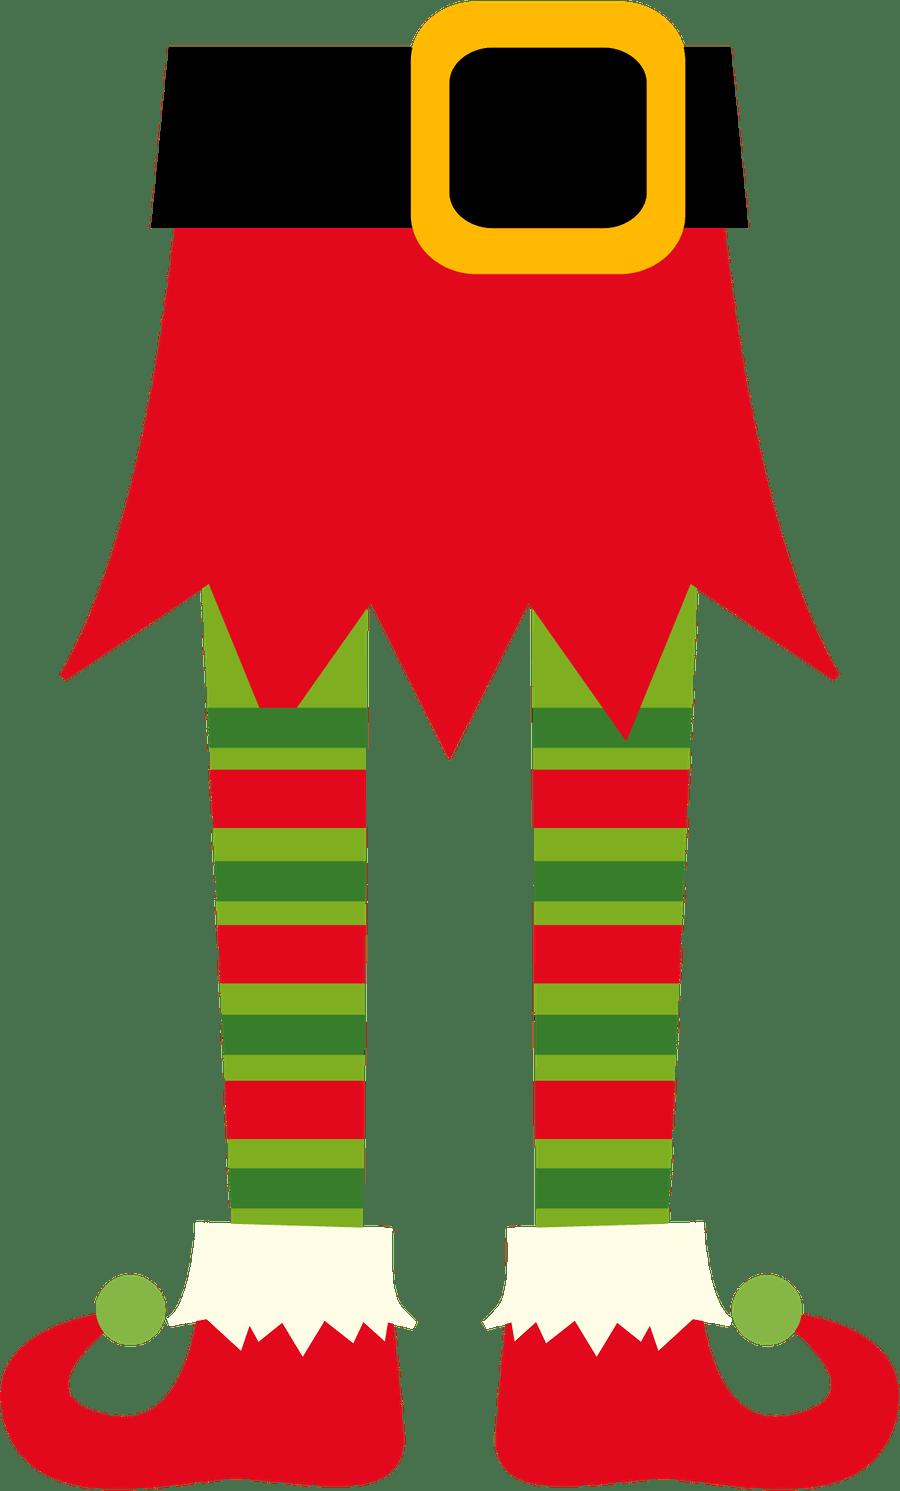 CHRISTMAS ELF CLIP ART CLIP ART CHRISTMAS 2 CLIPART